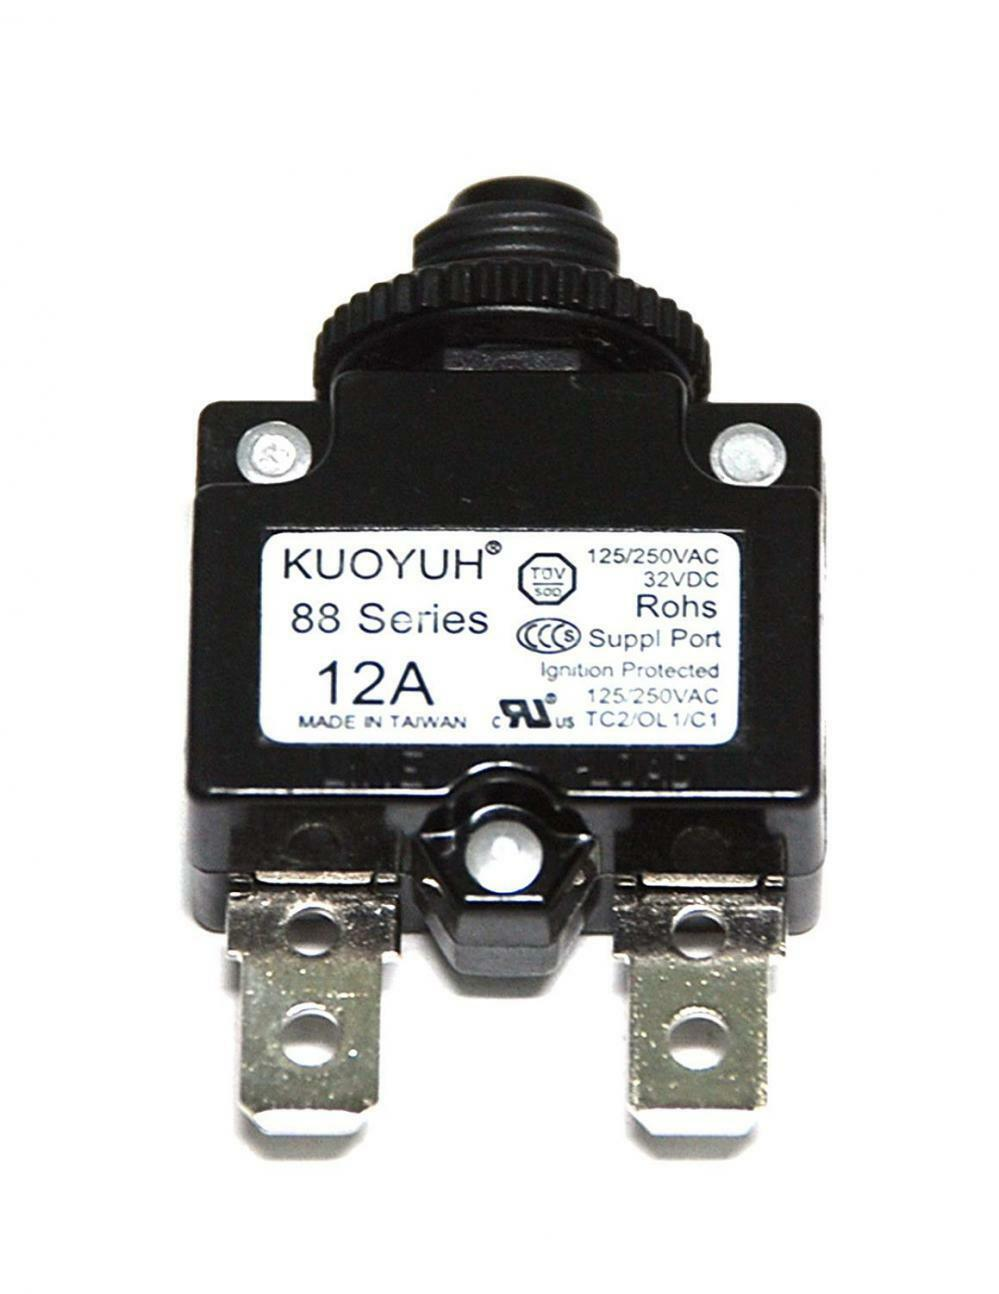 KUOYUH Circuit Breaker 88 series 125//250VAC 50//60Hz 13 Amp – 1pc